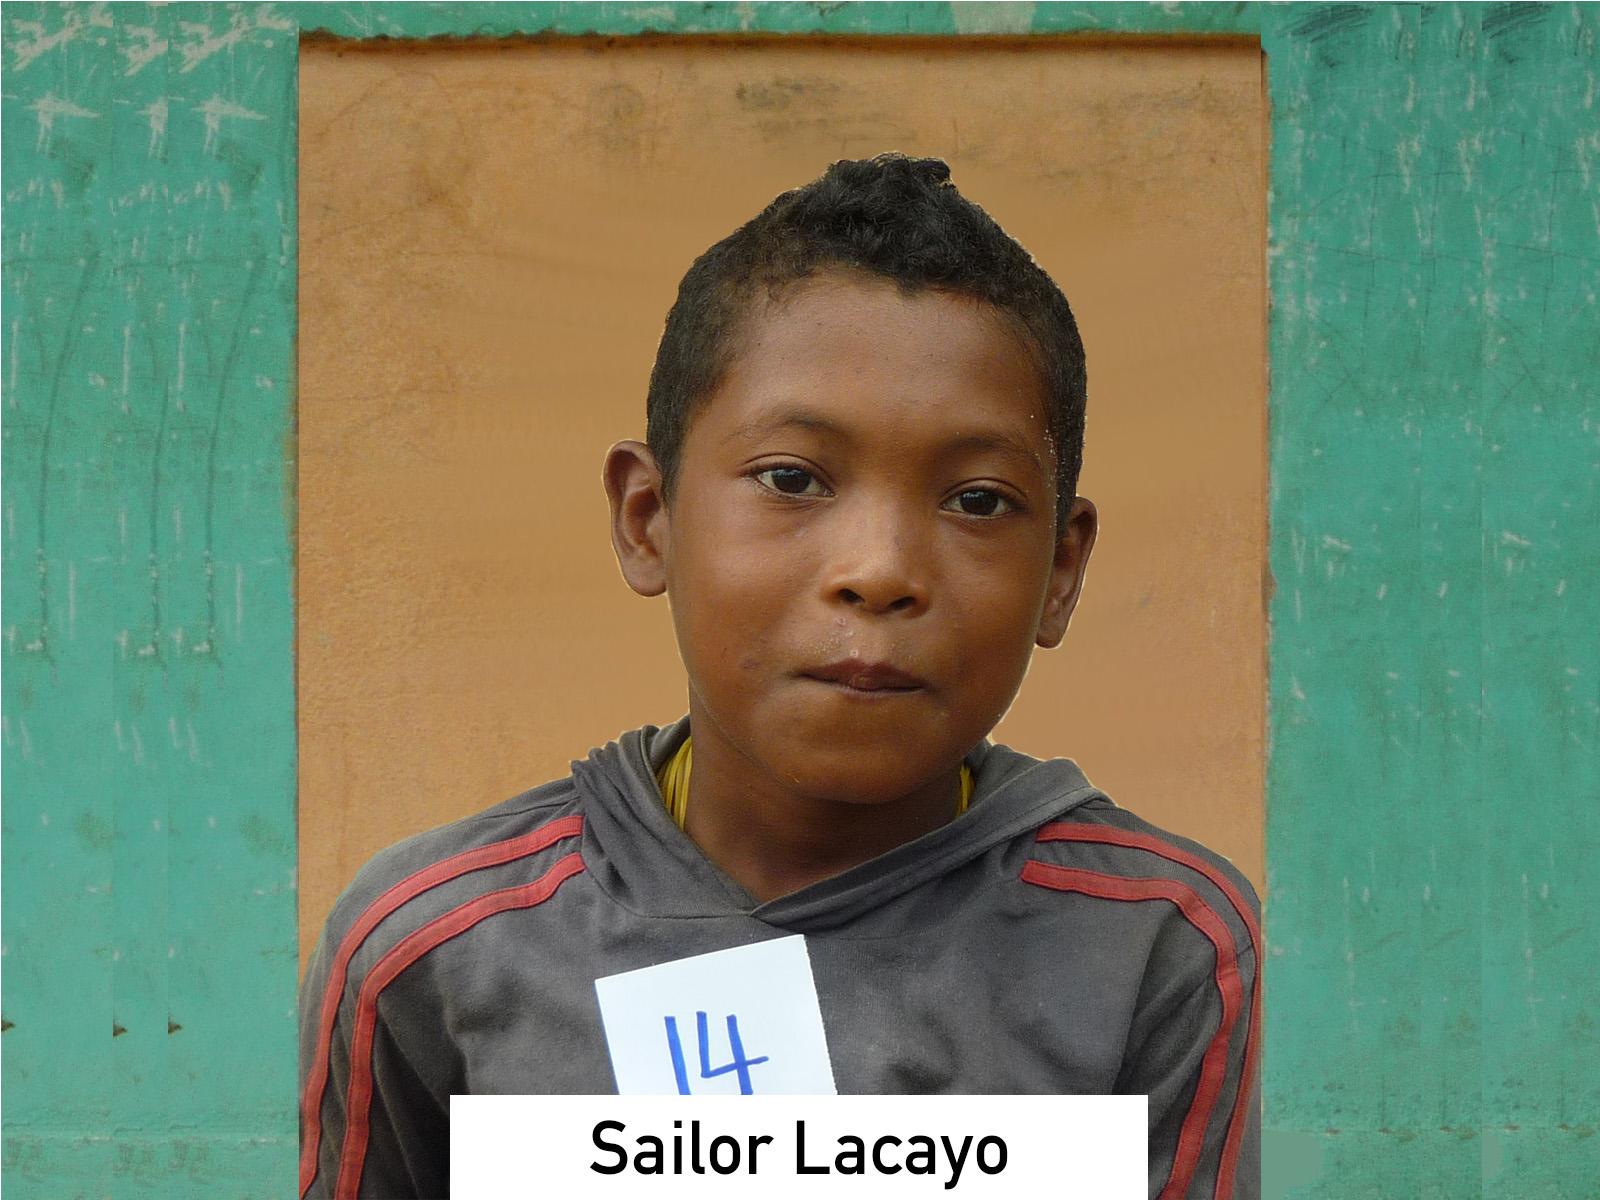 014 - Sailor Lacayo.jpg